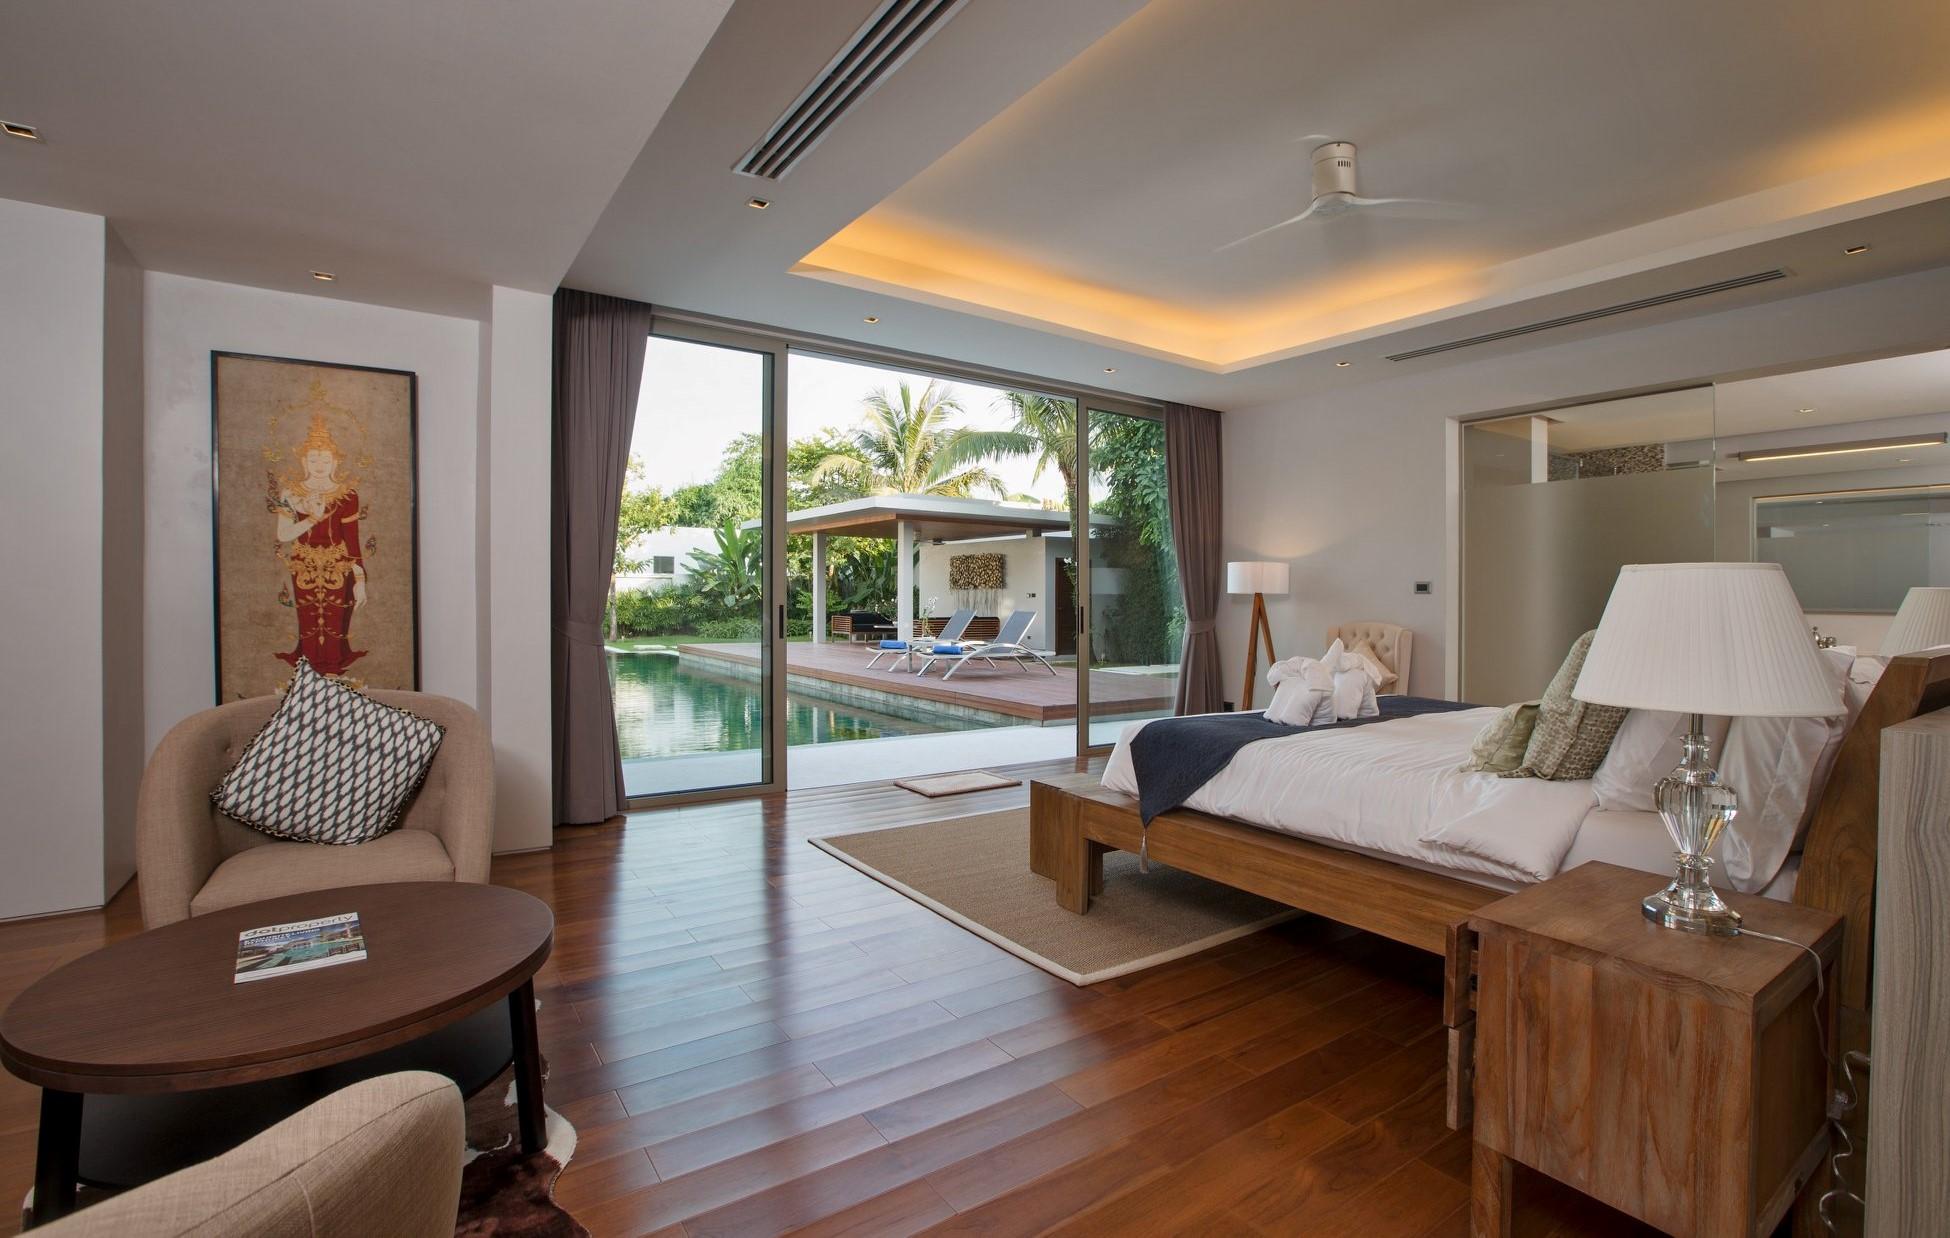 Phuket Real Eastate Agency – Laguna (9)